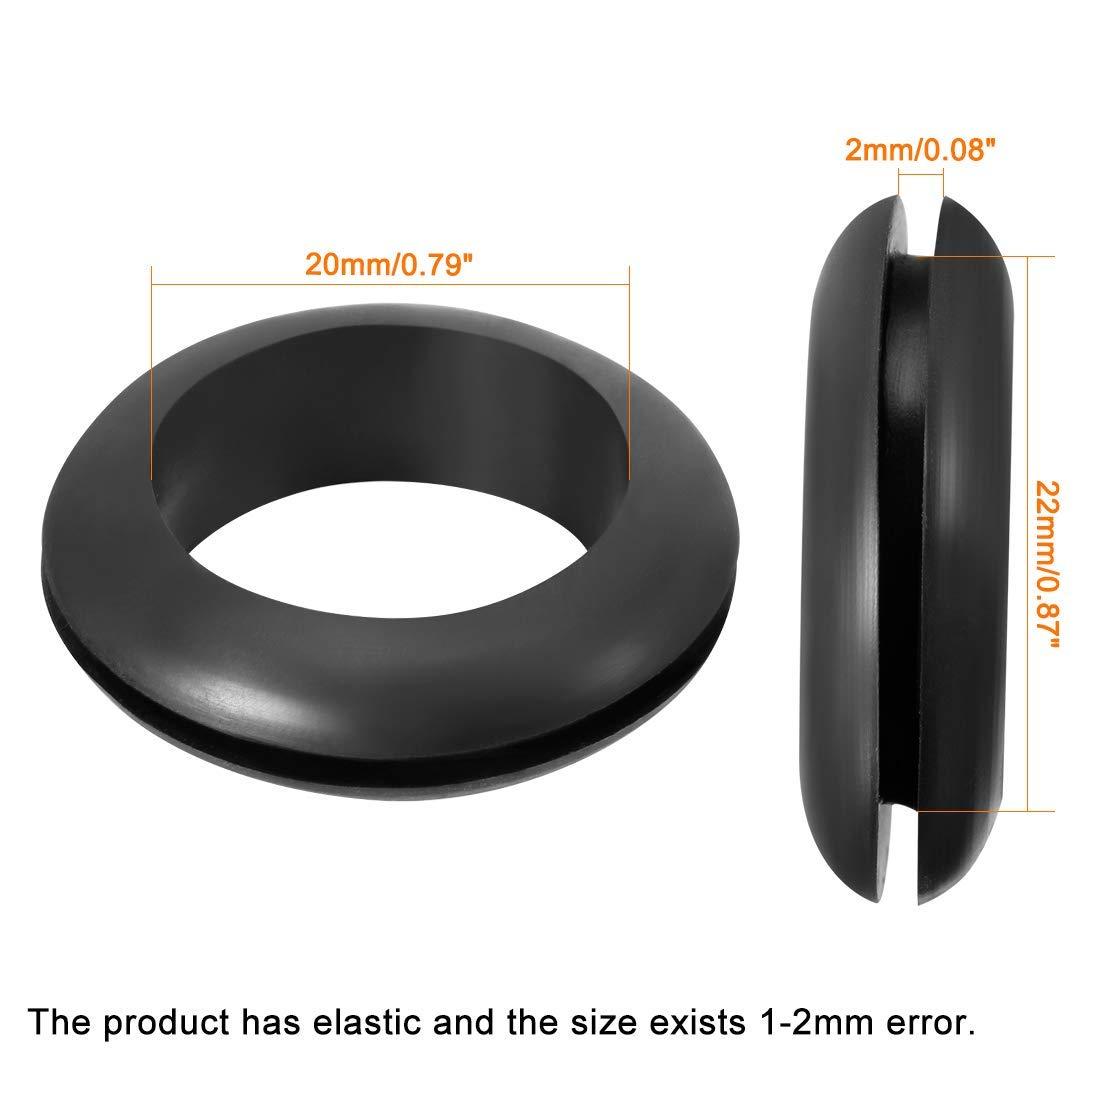 Wire Protector Oil Resistant Armature Grommet Rubber 20mm Internal Dia 100Pcs Black